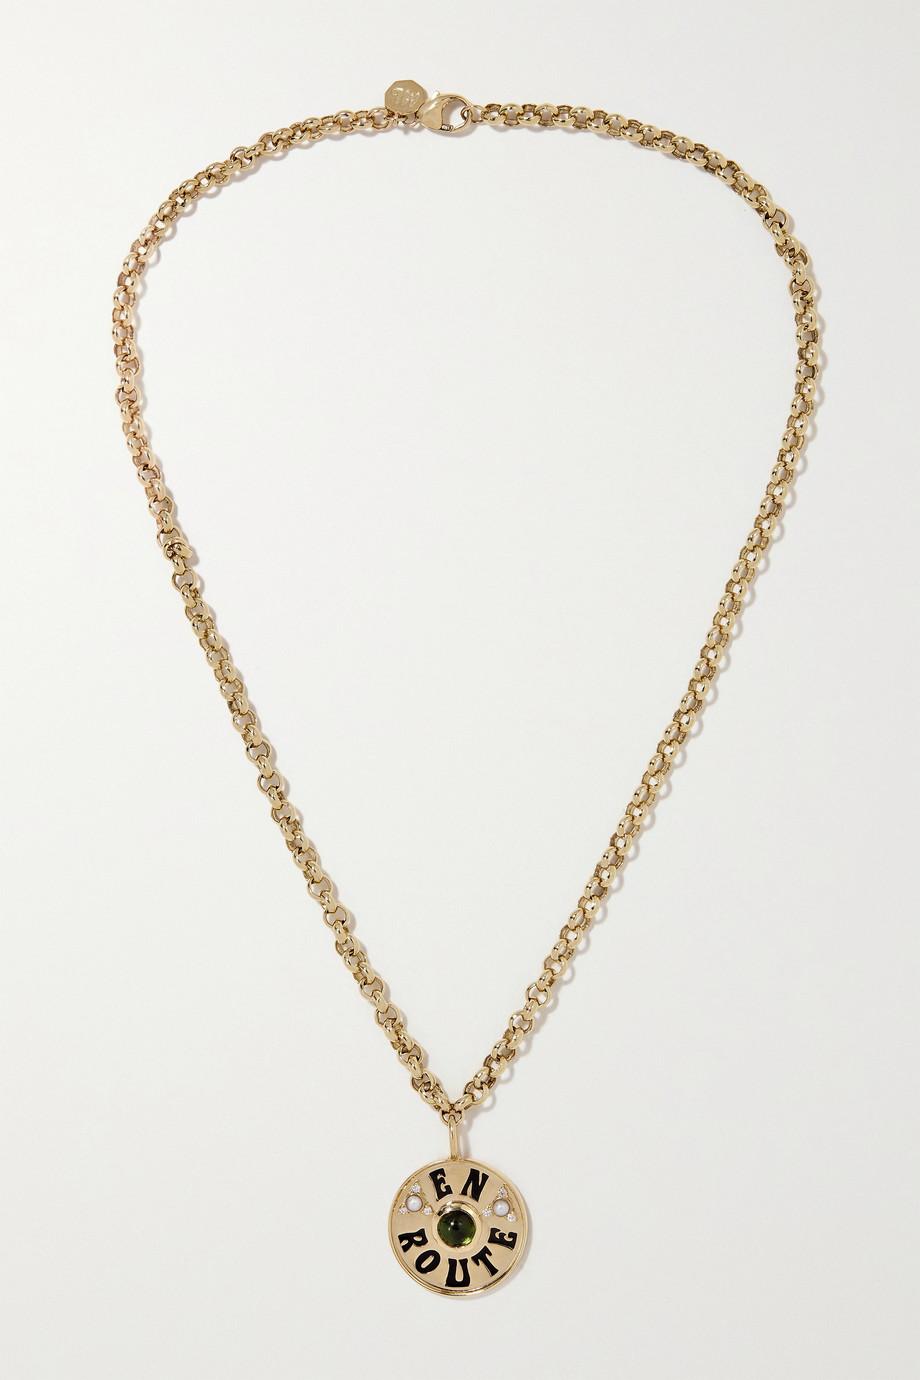 Marlo Laz En Route 14-karat gold, enamel and multi-stone necklace